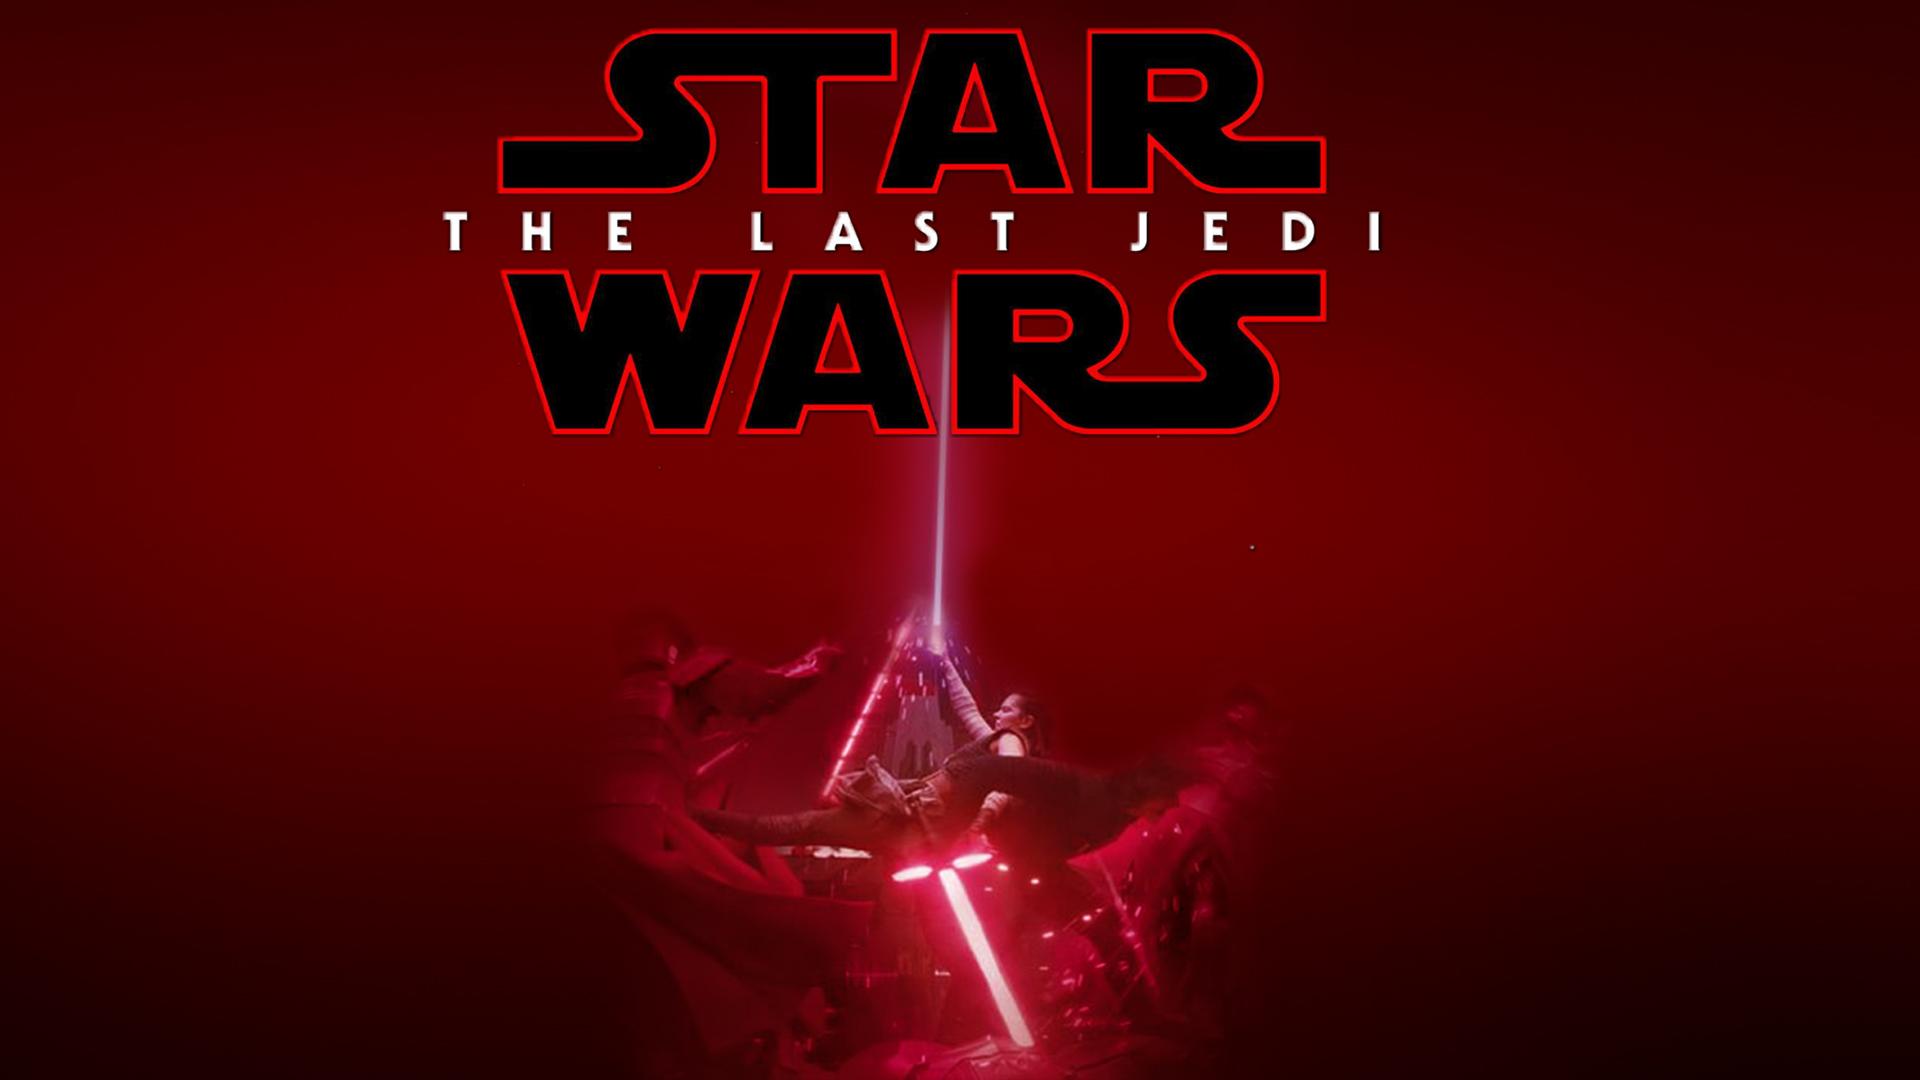 Star Wars The Last Jedi Wallpaper By The Dark Mamba 995 On Deviantart